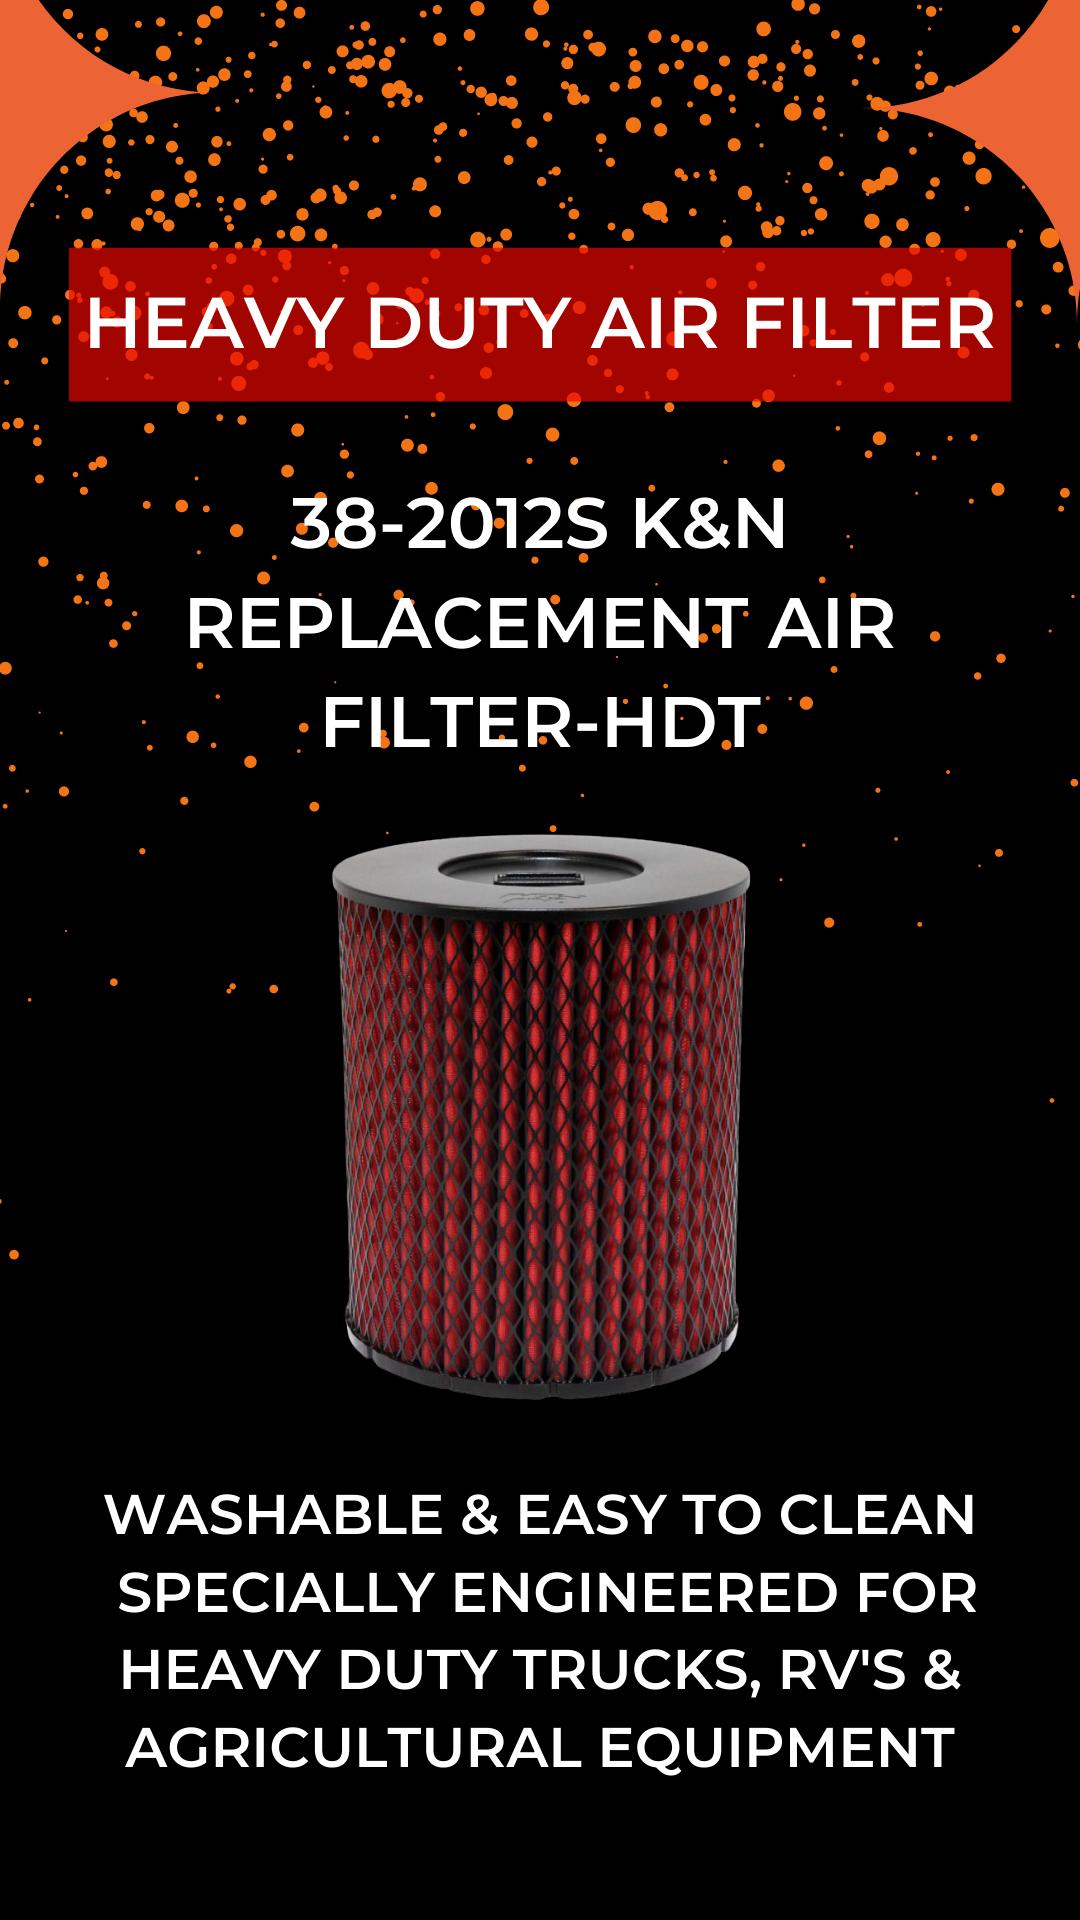 382012S K&N Replacement Air FilterHDT in 2020 Air